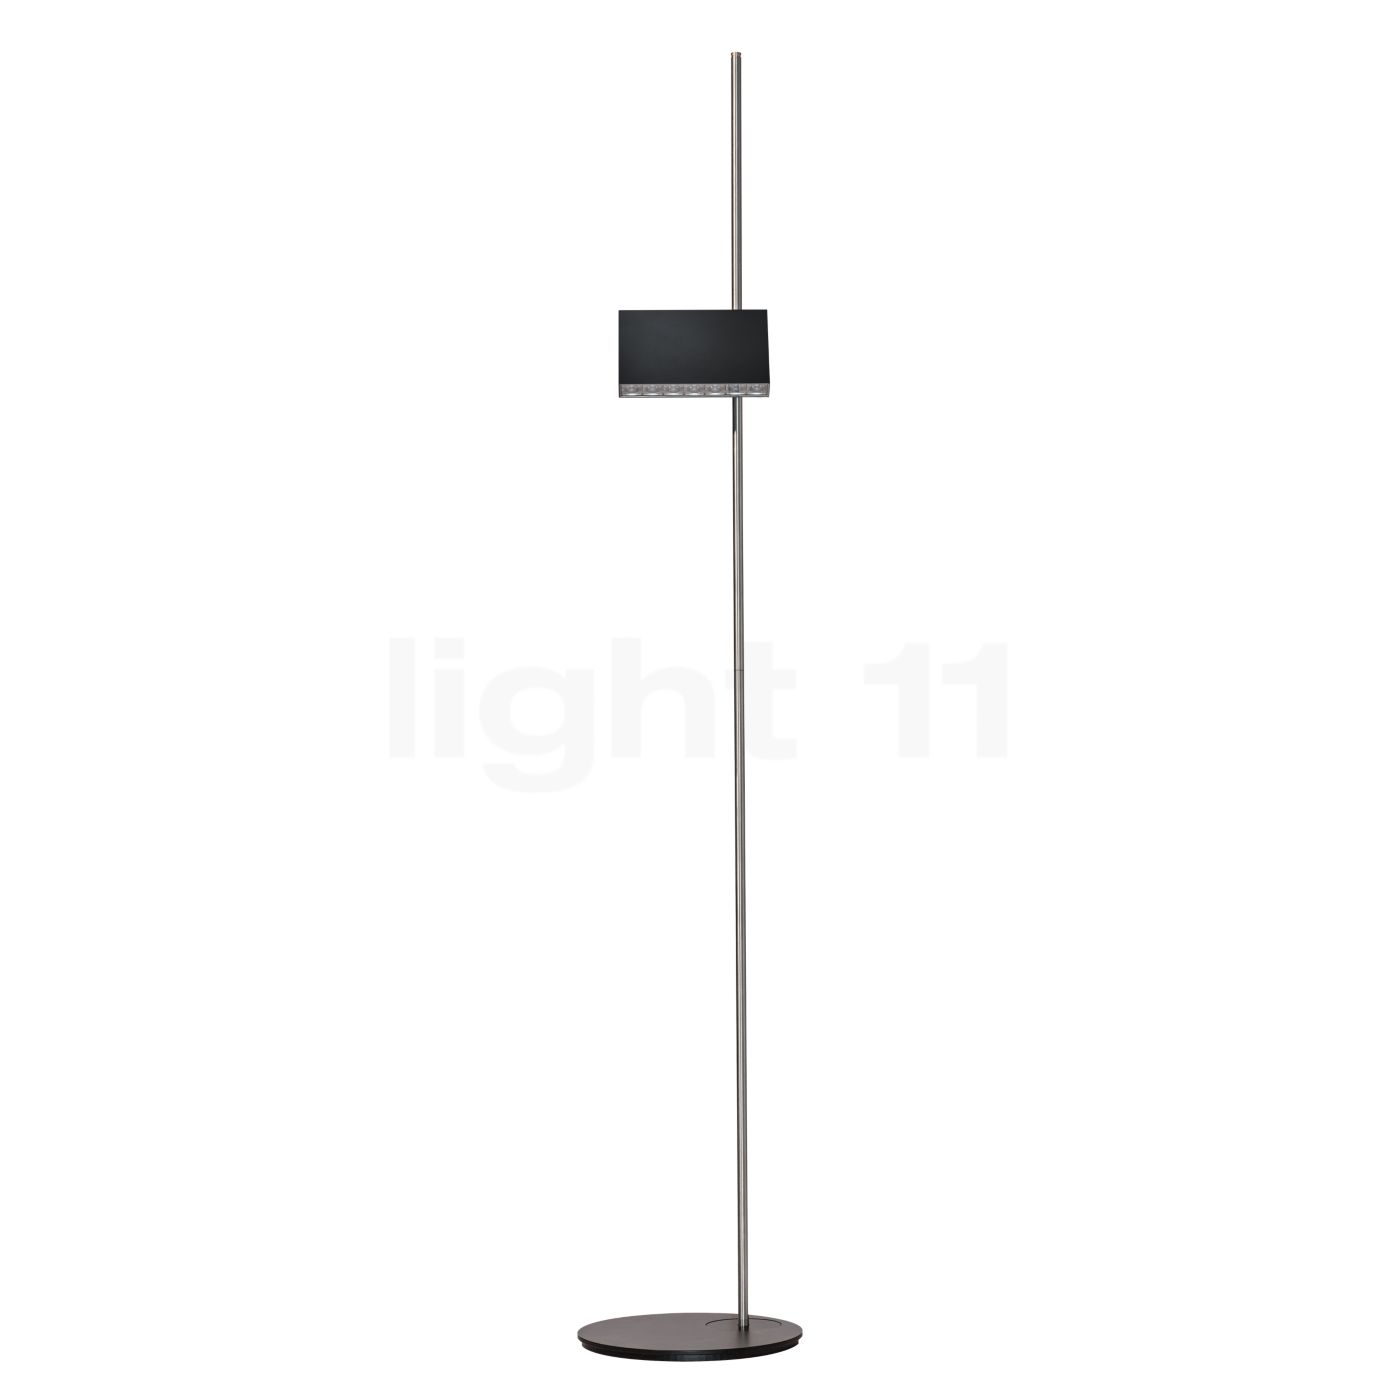 Mawa FBL-Stehleuchte LED kaufen bei light11.de